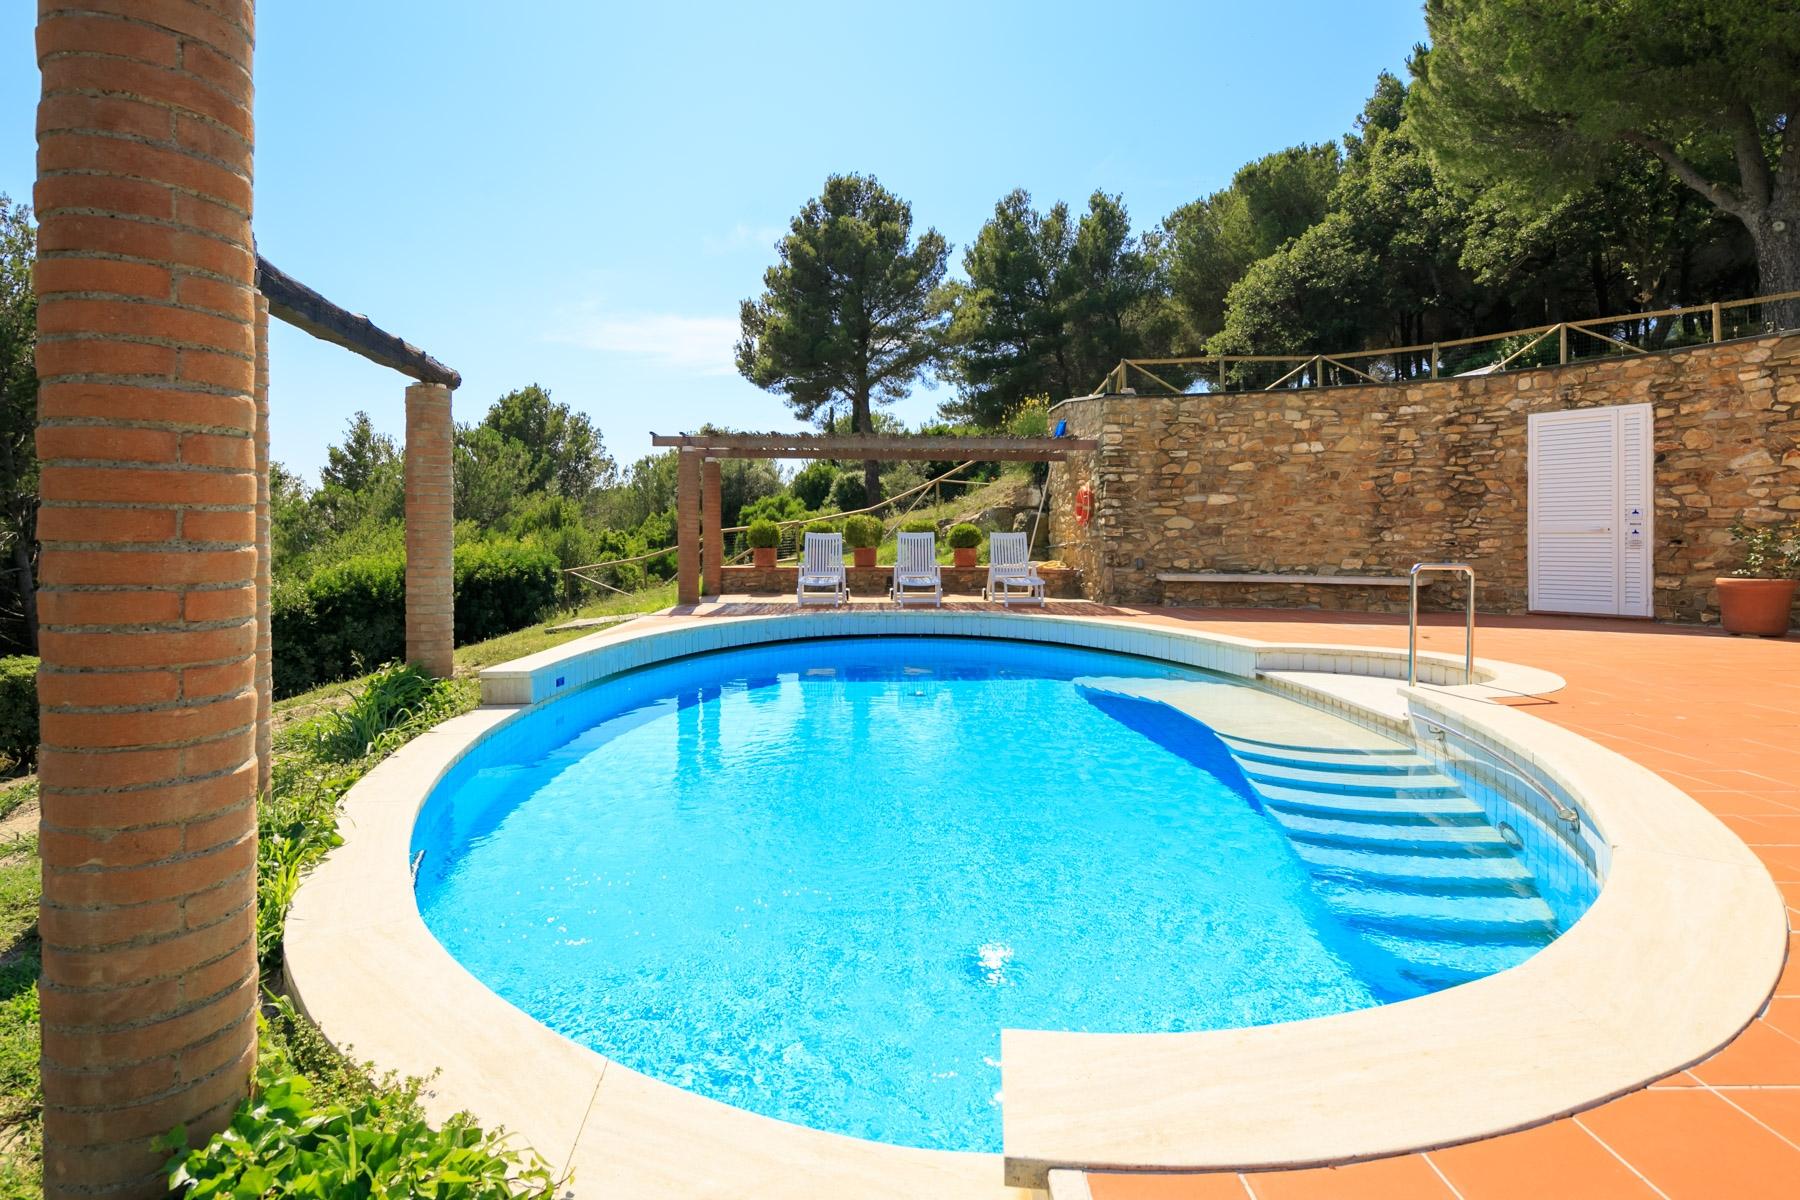 Villa in Vendita a Campiglia Marittima: 5 locali, 1100 mq - Foto 1